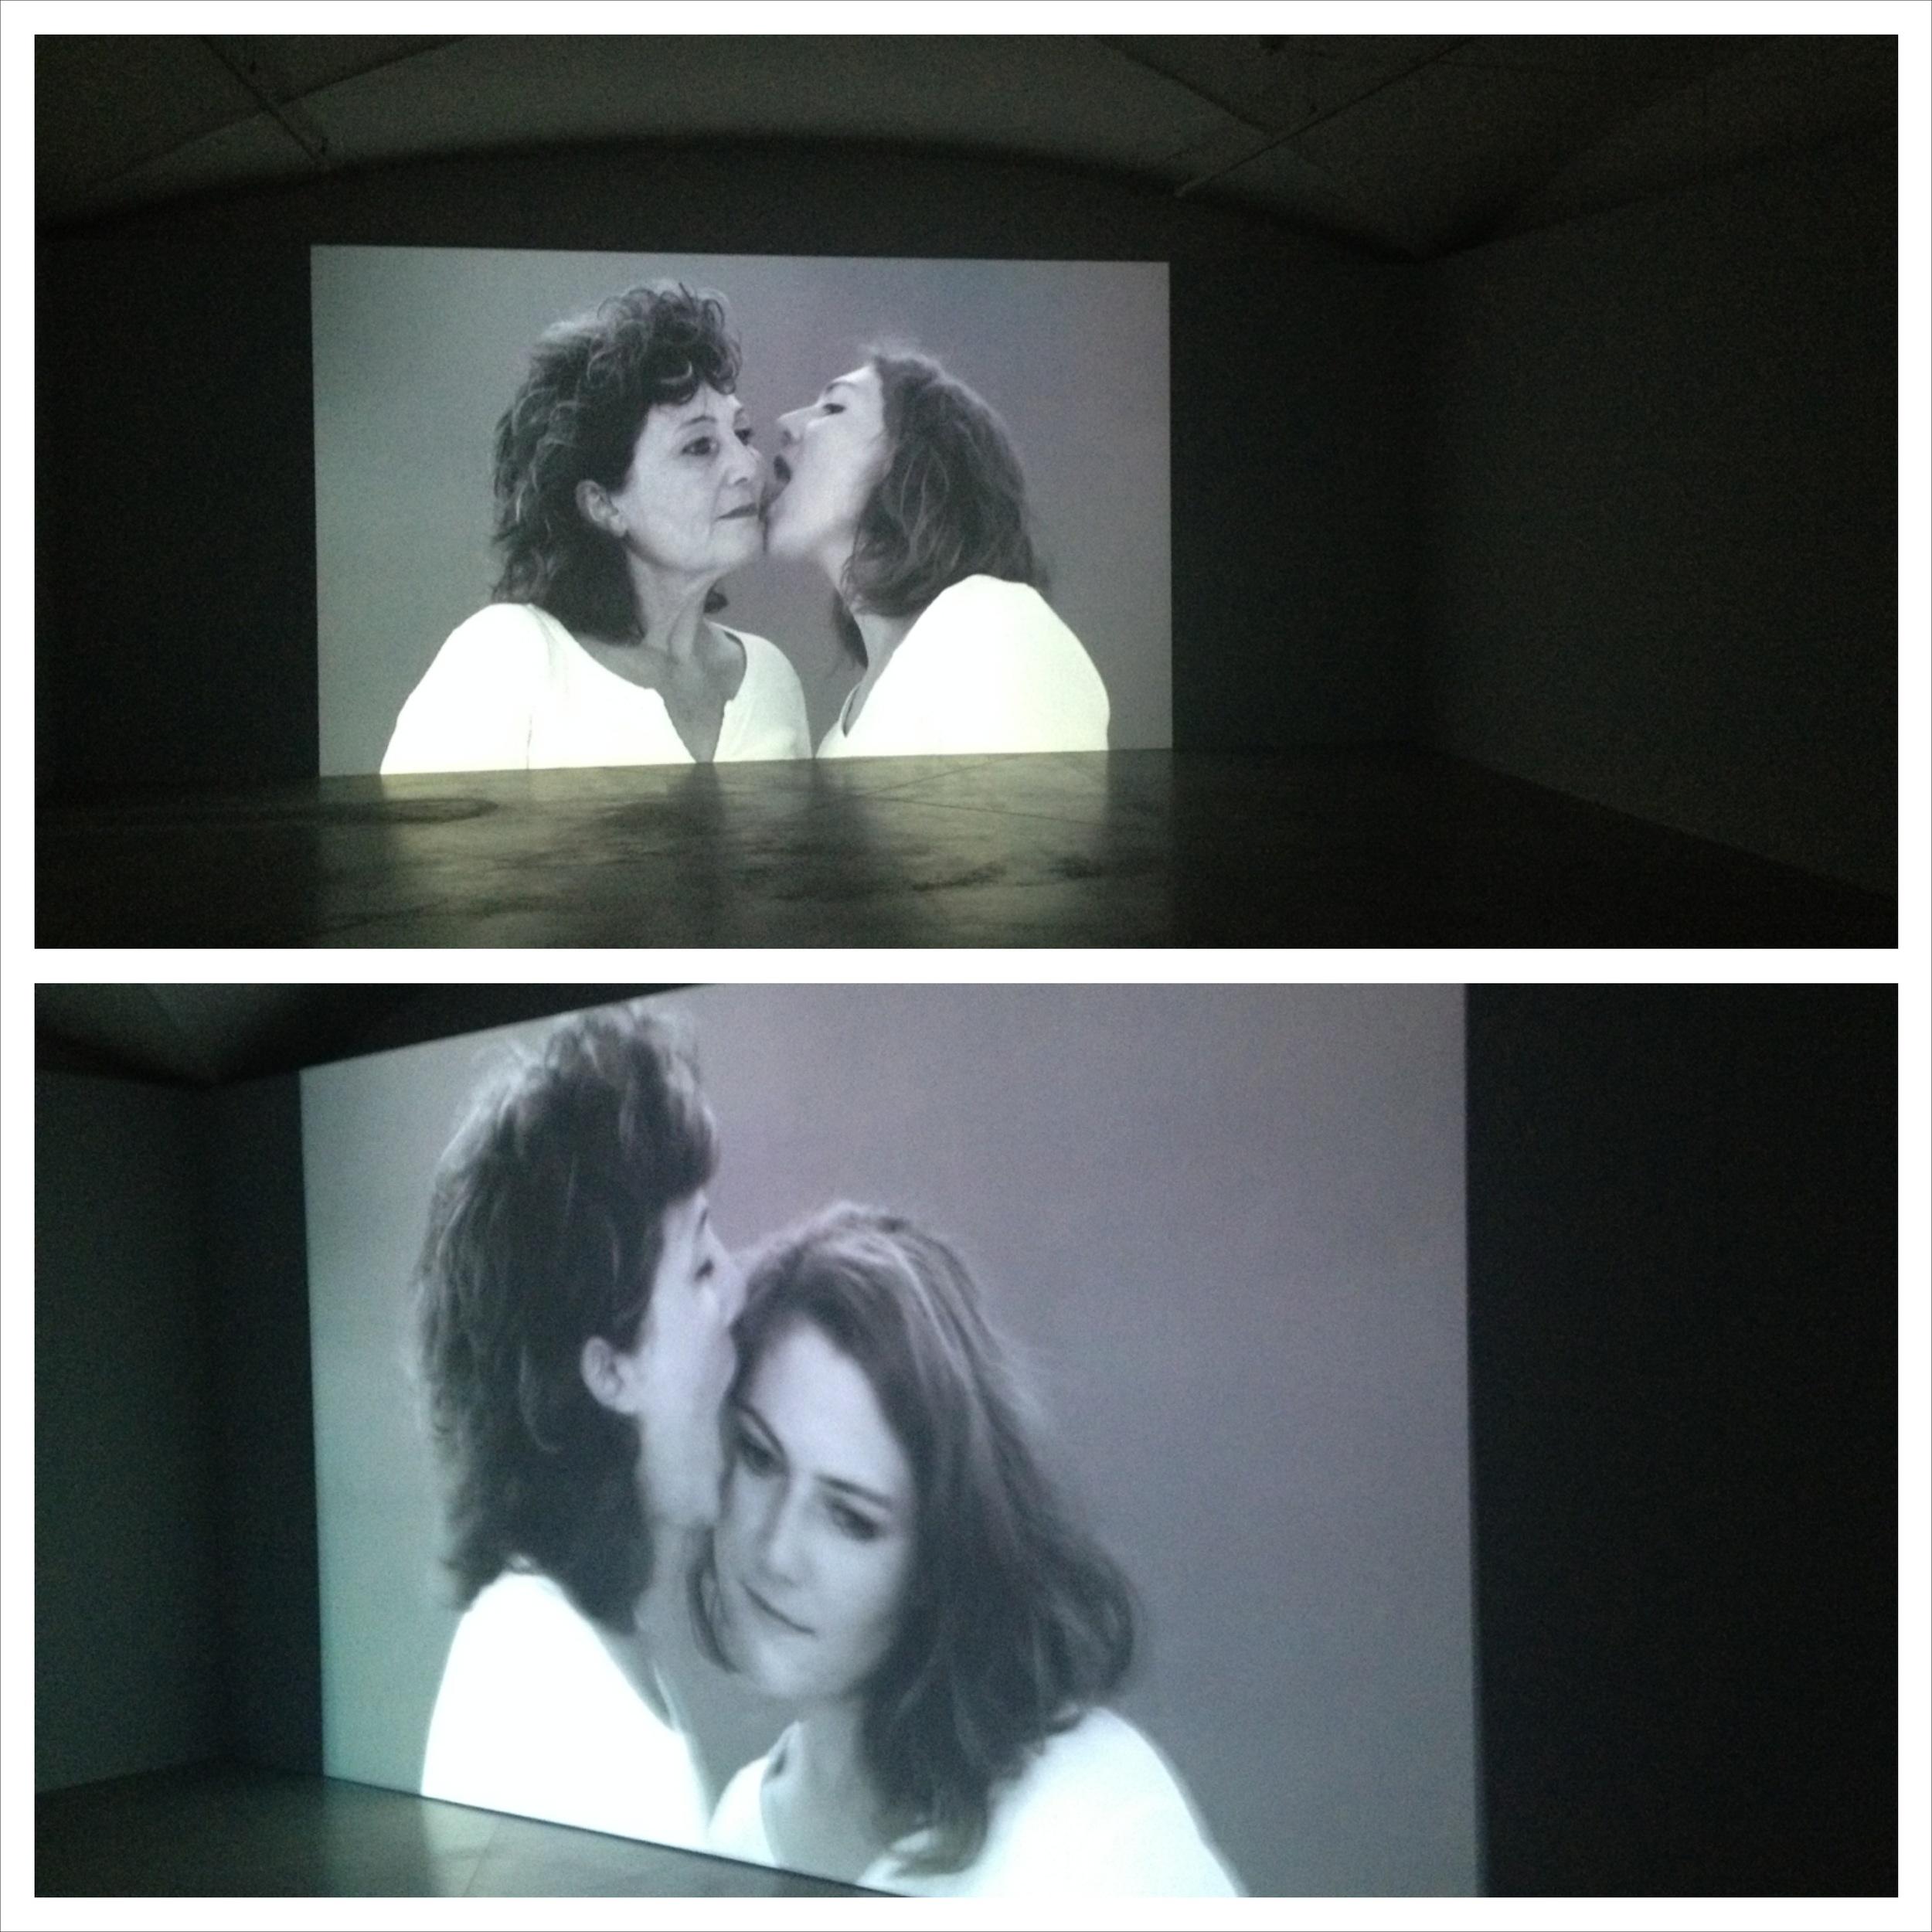 Mother Tongue, Chrischa Oswald, 2013